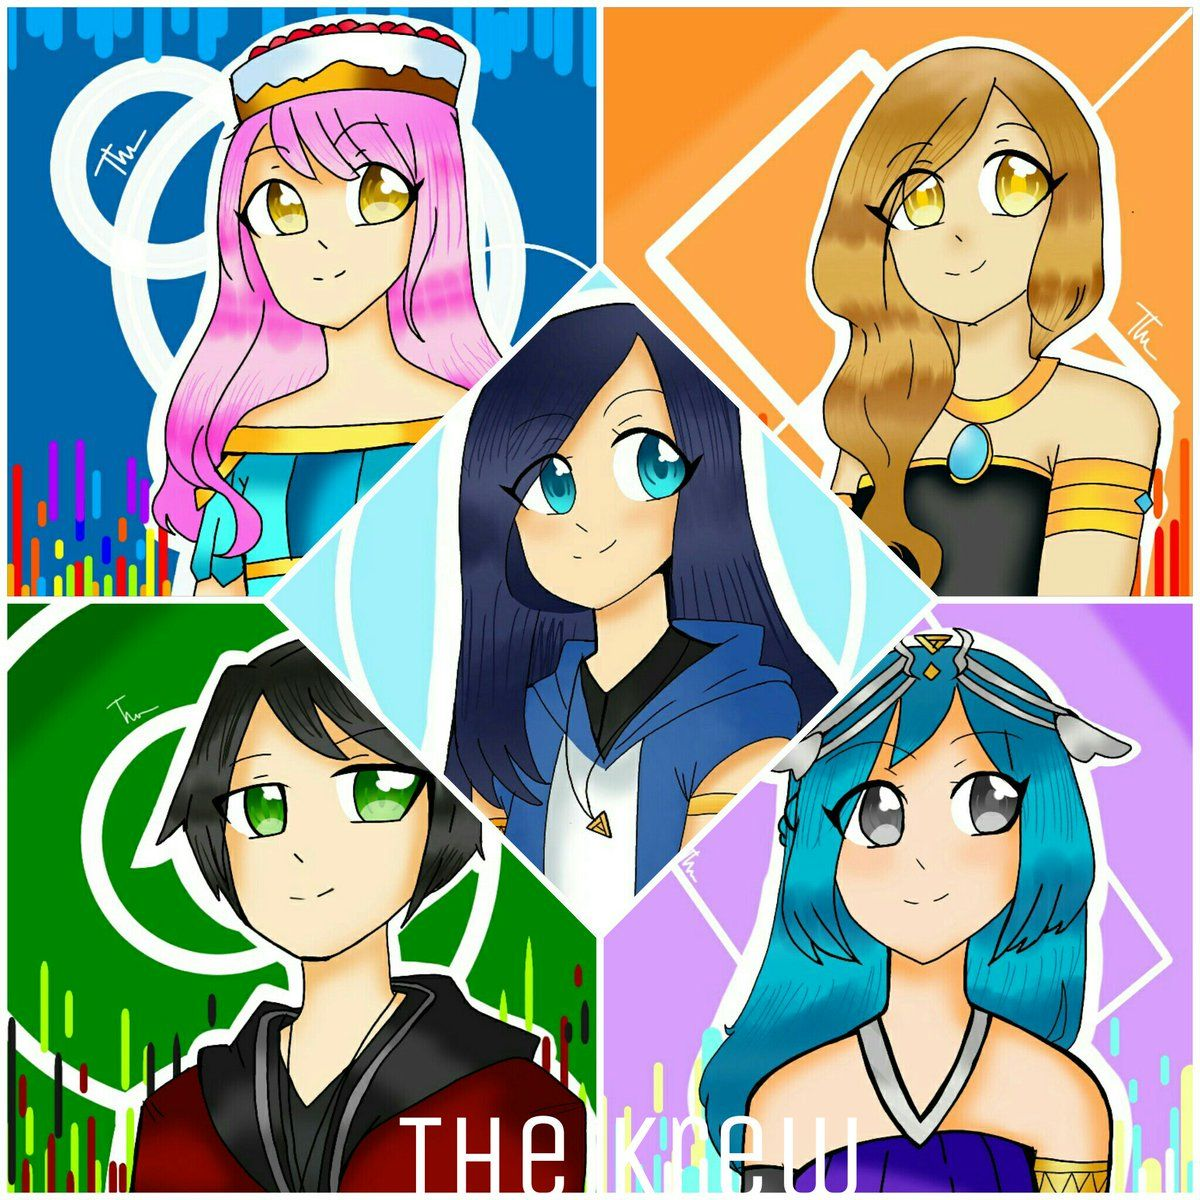 The Krew Cute Youtubers Cute Drawings Youtube Art